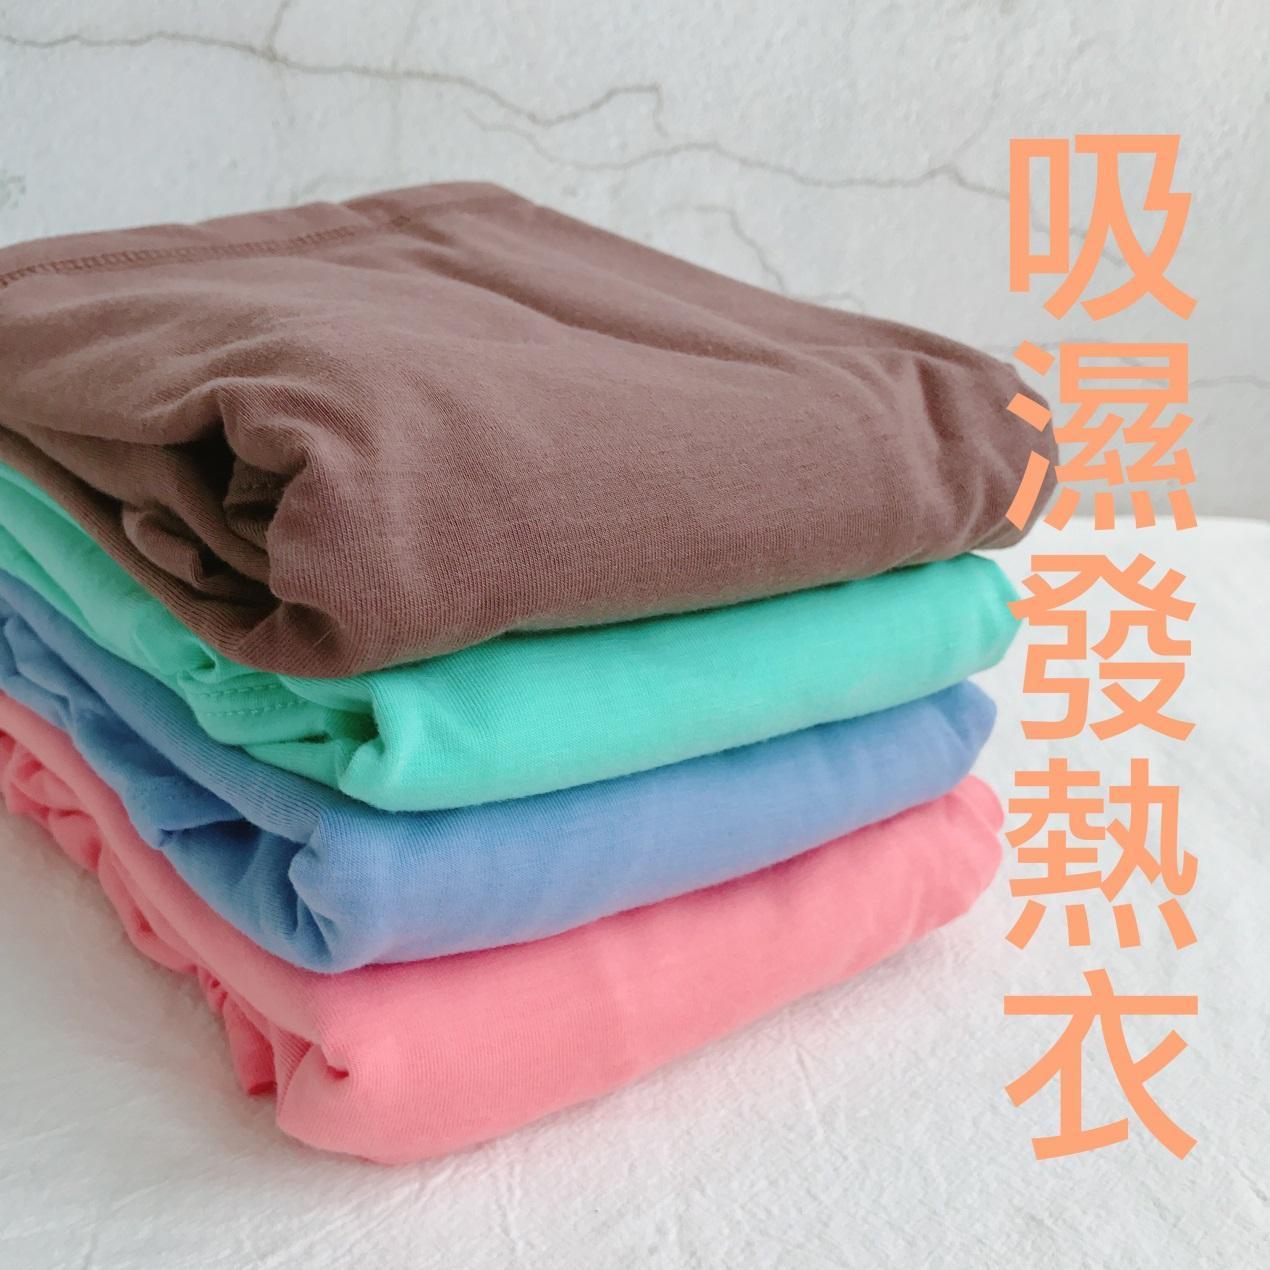 C:\Users\S3-55\Desktop\E-Heart~ 伊心極暖體驗吸濕發熱衣(1入) 黑咖啡果綠粉橘粉紫\1.jpg